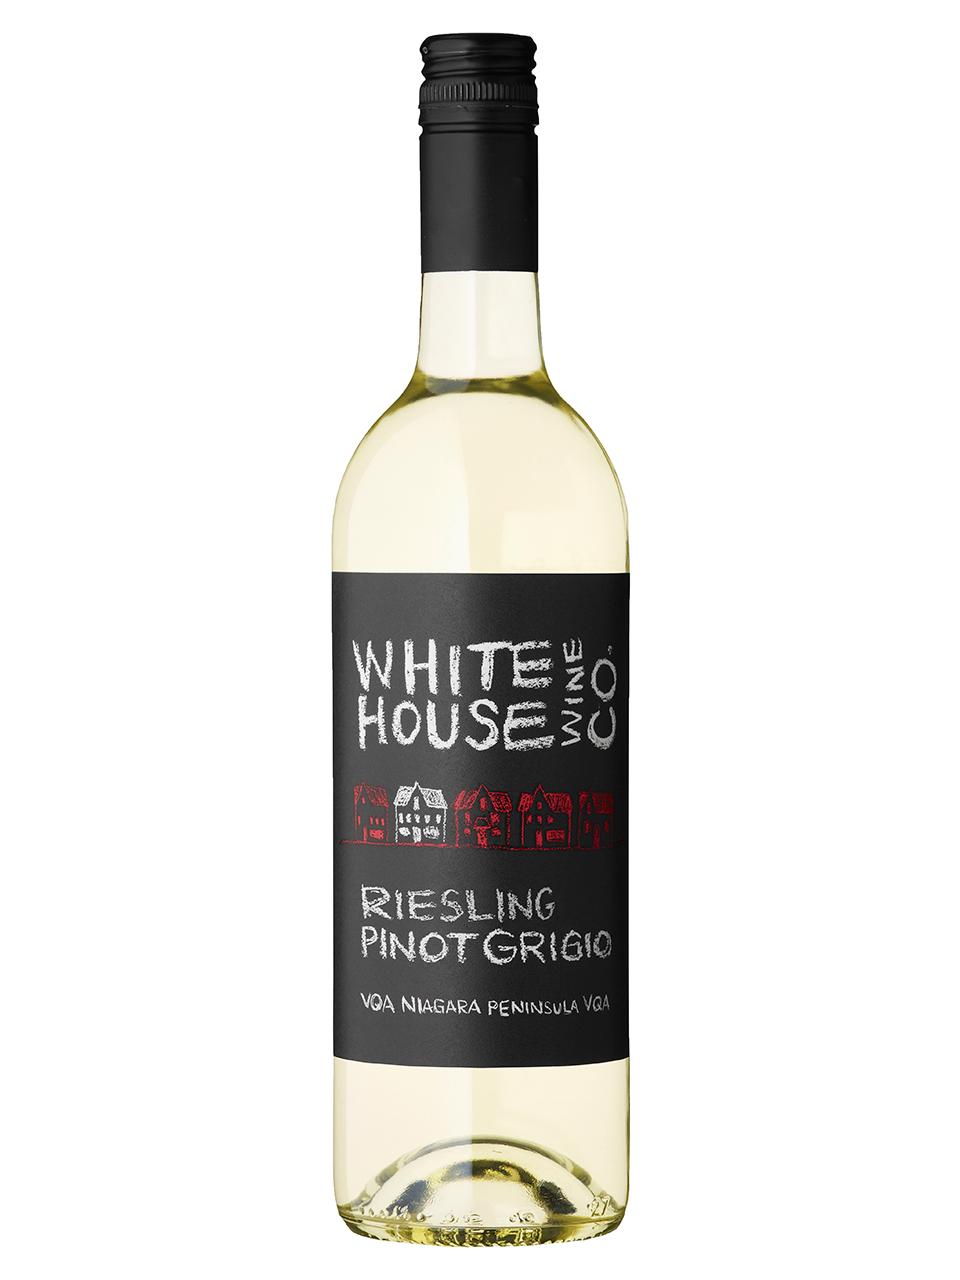 White House Wine Company Riesling Pinot Grigio VQA